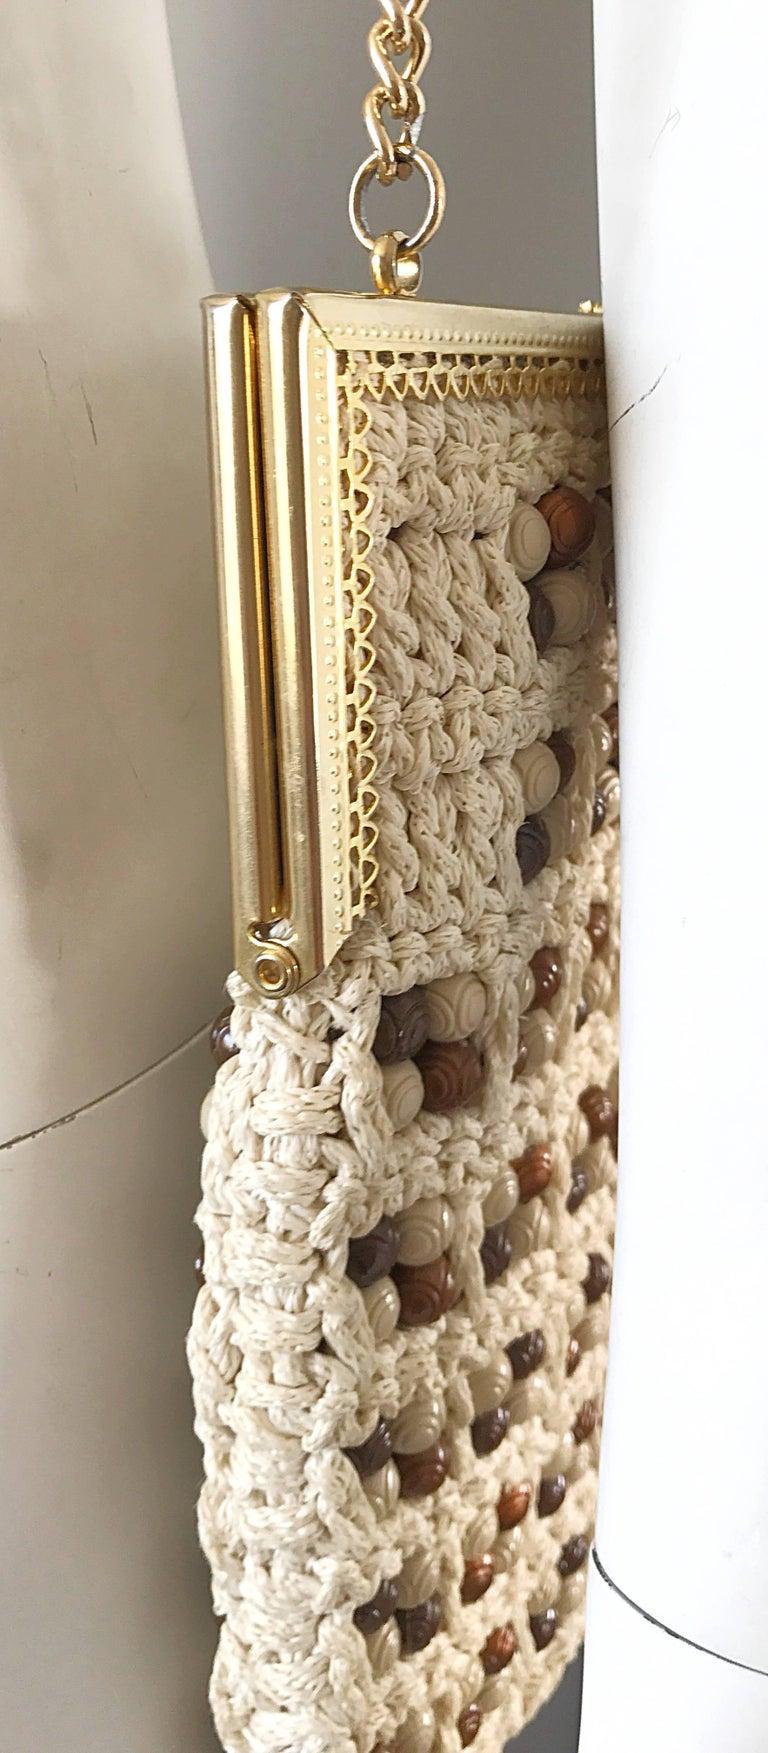 Women's 1970s Italian Ivory + Brown Hand Crochet Gold Chain Boho Vintage Shoulder Bag  For Sale